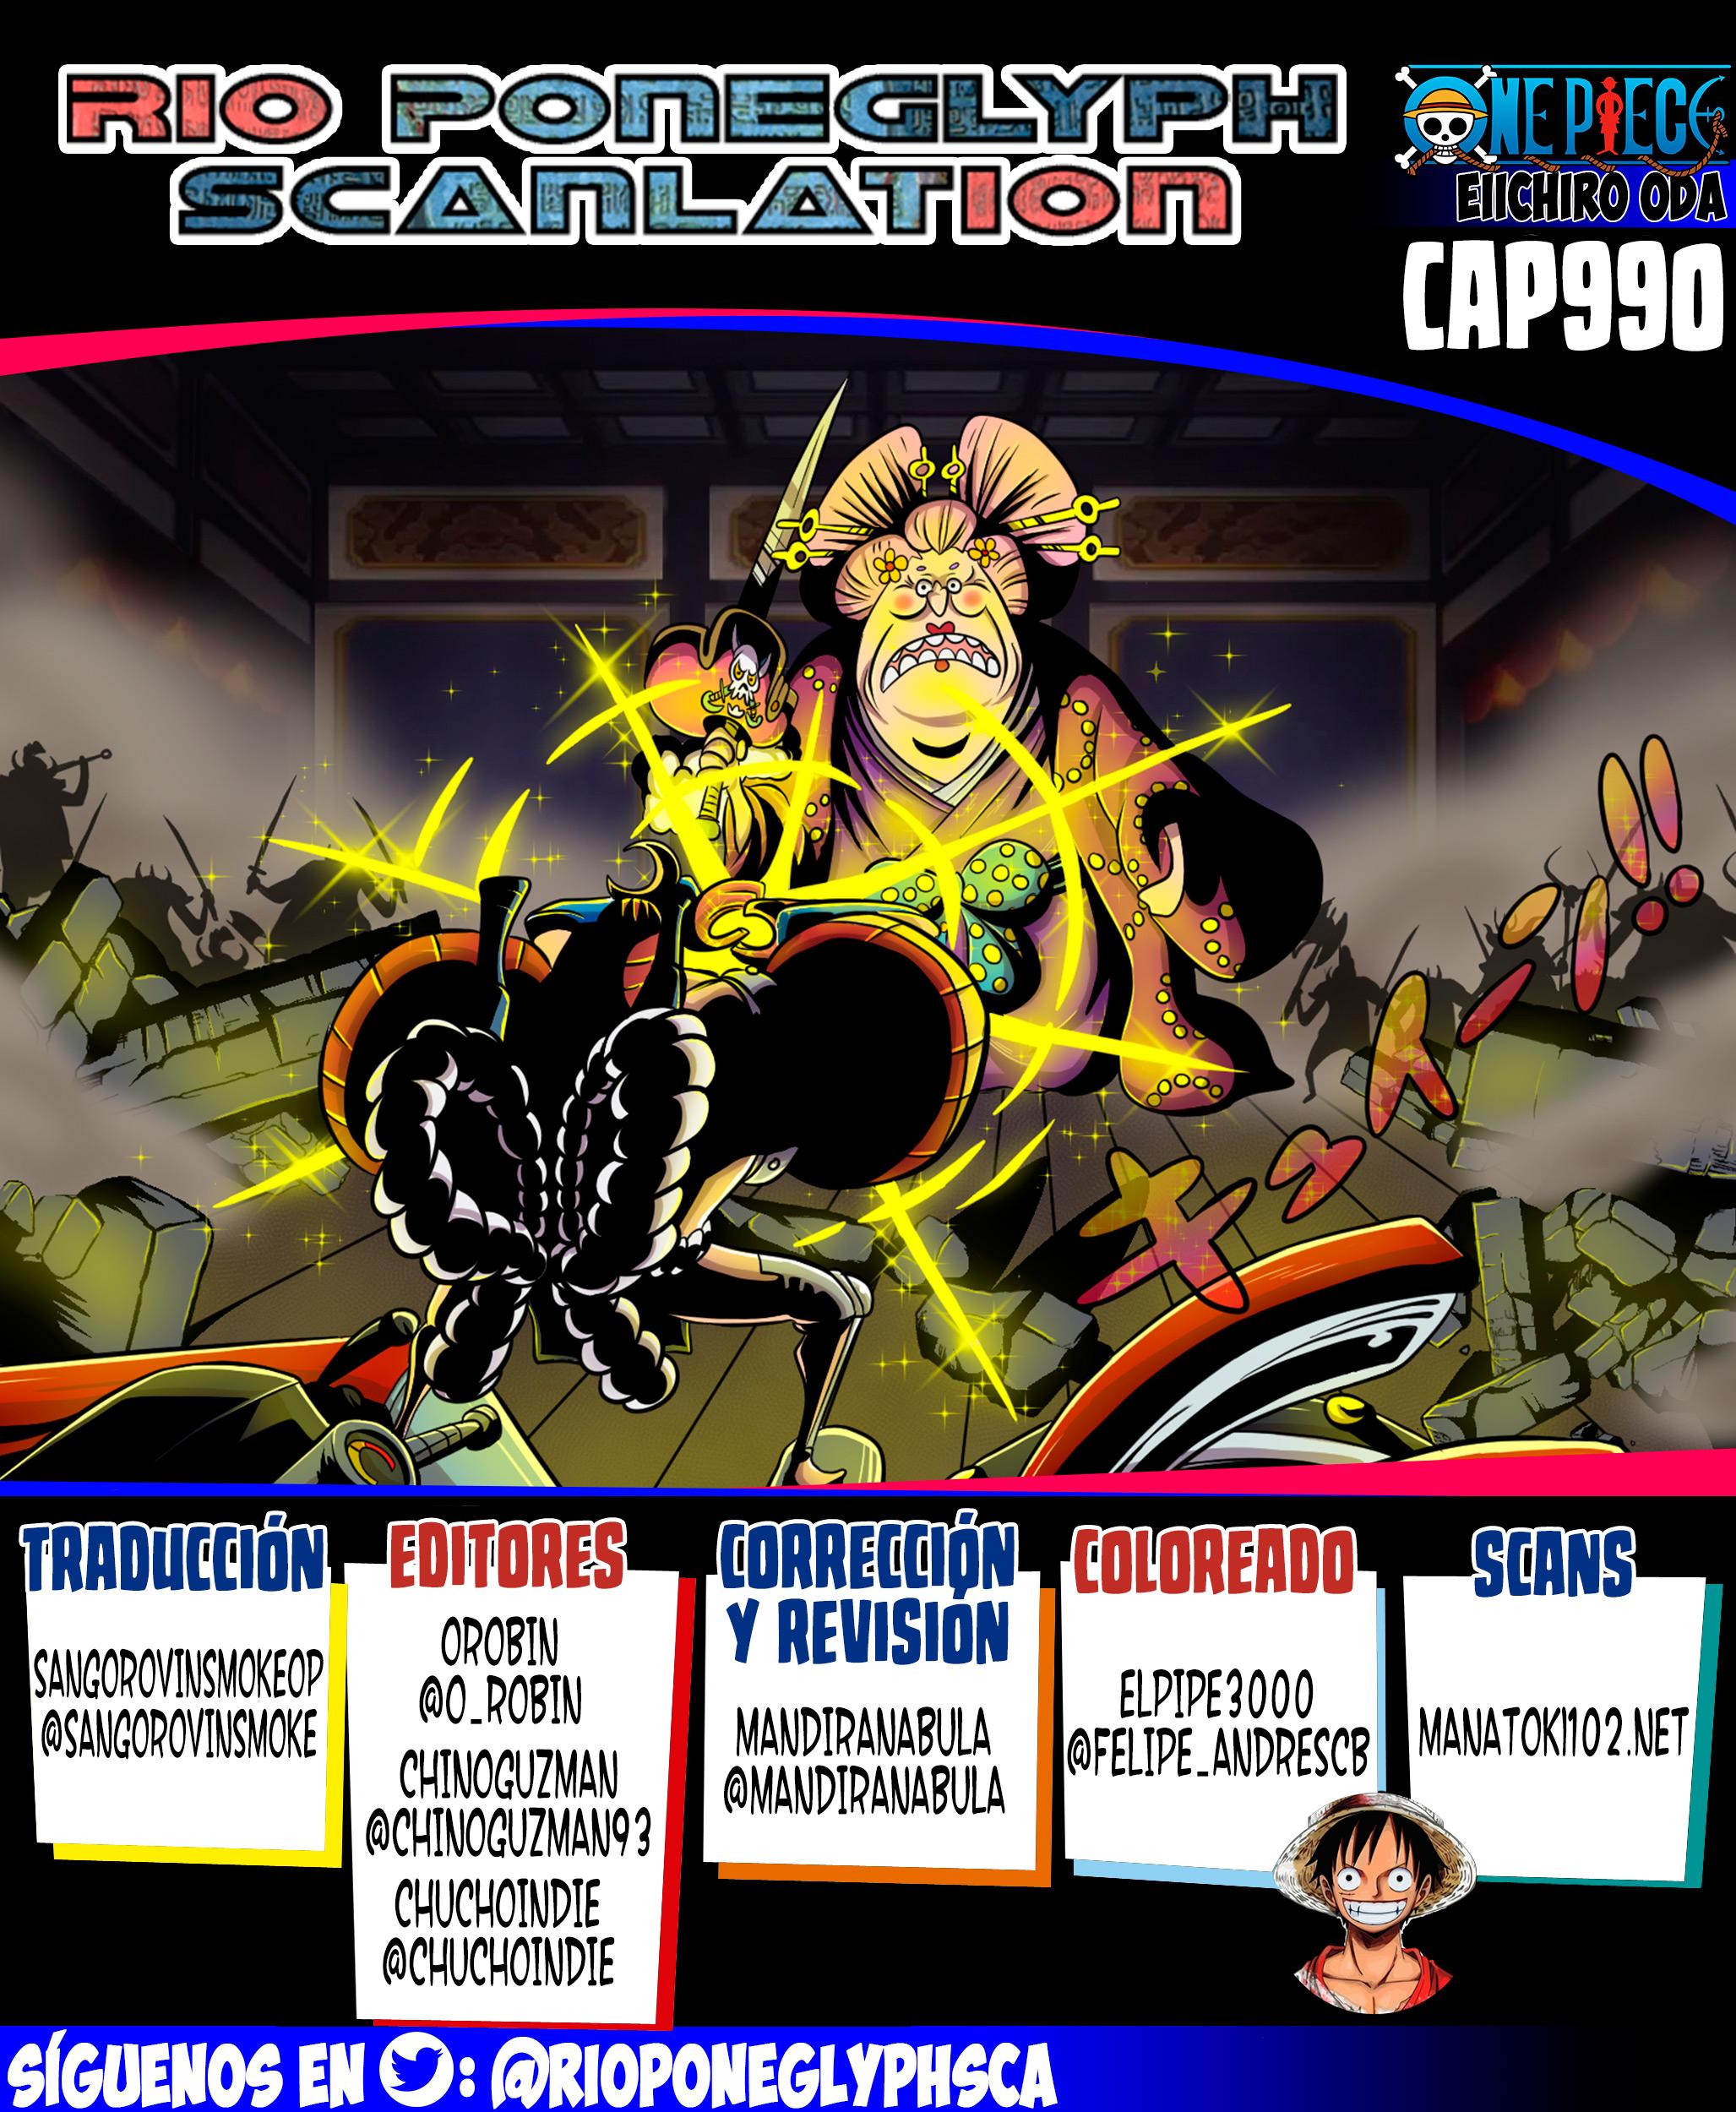 One Piece Manga 990 [Español] [RioPoneglyph Scan] 17